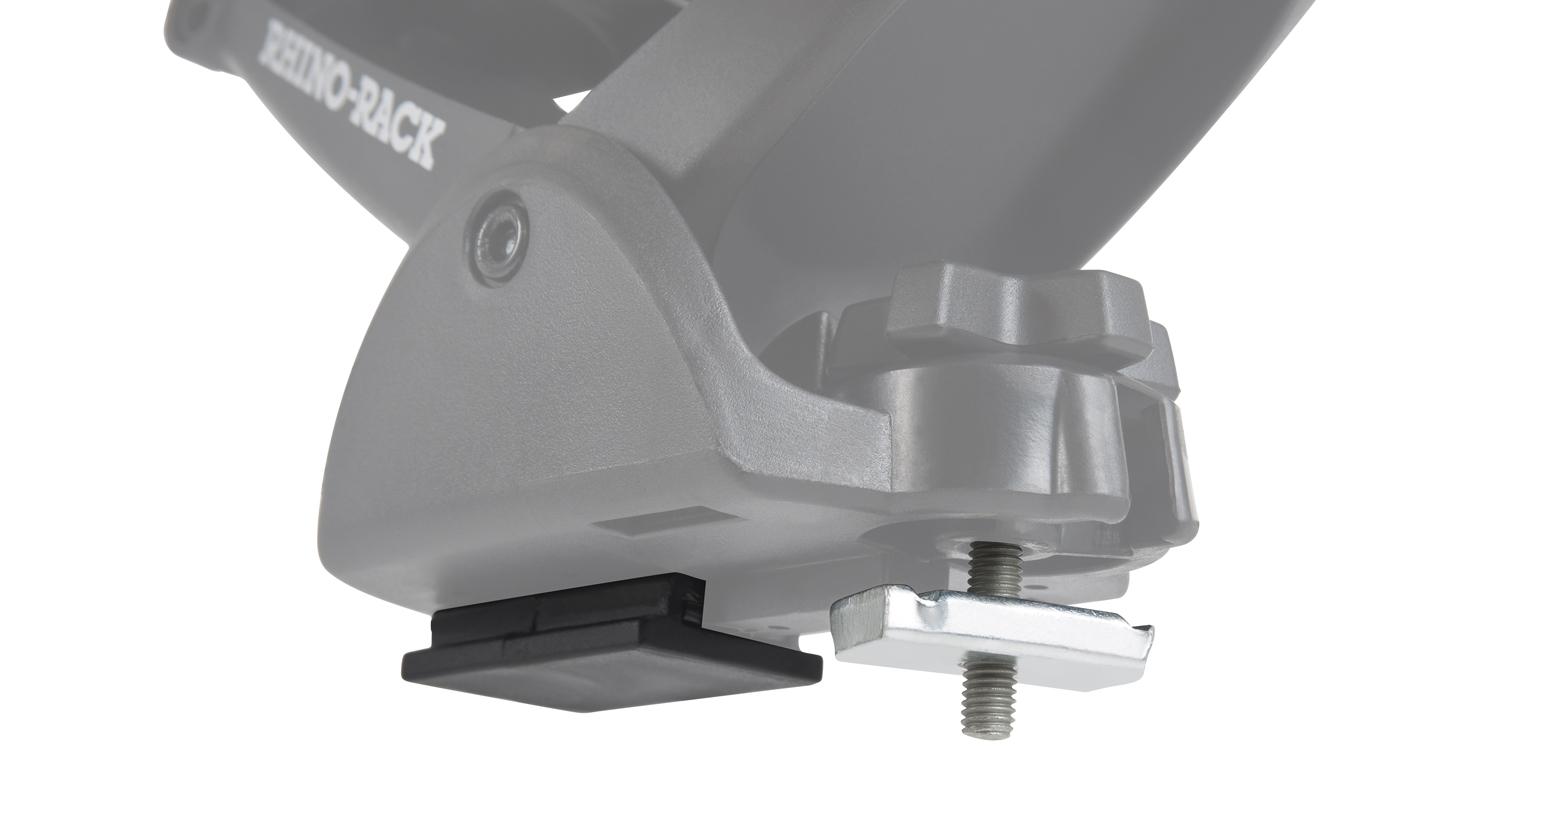 Rhino Roof Rack Fitting Kit Kayak Carrier For Nautic 580 581 HD-FK2